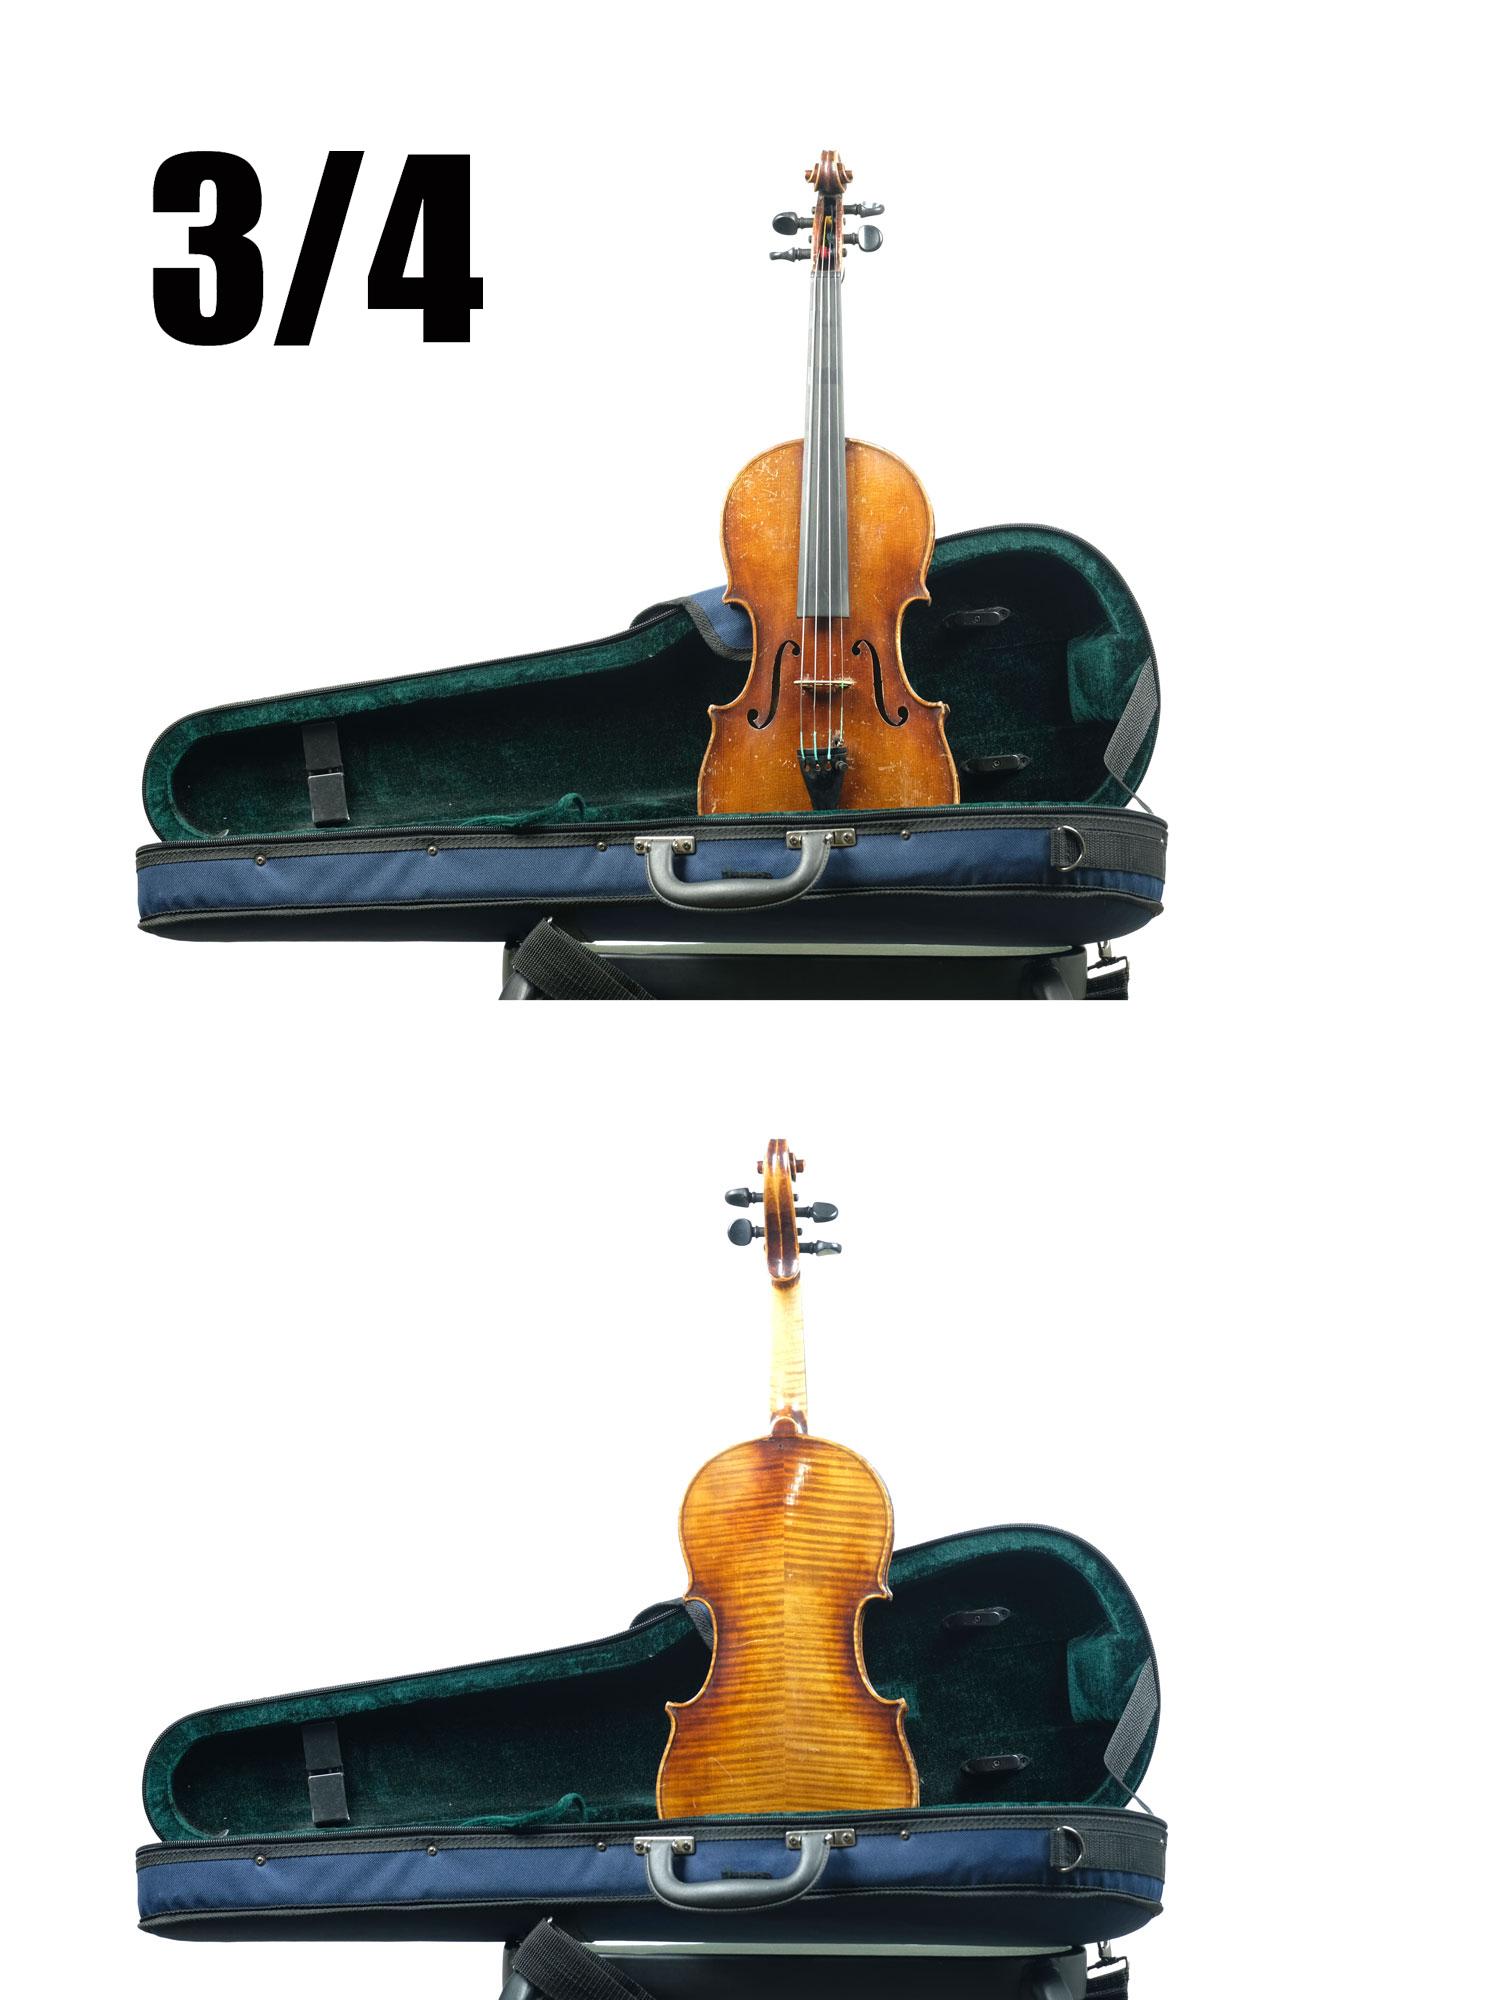 ¾ Violin by Hermann Lovendal